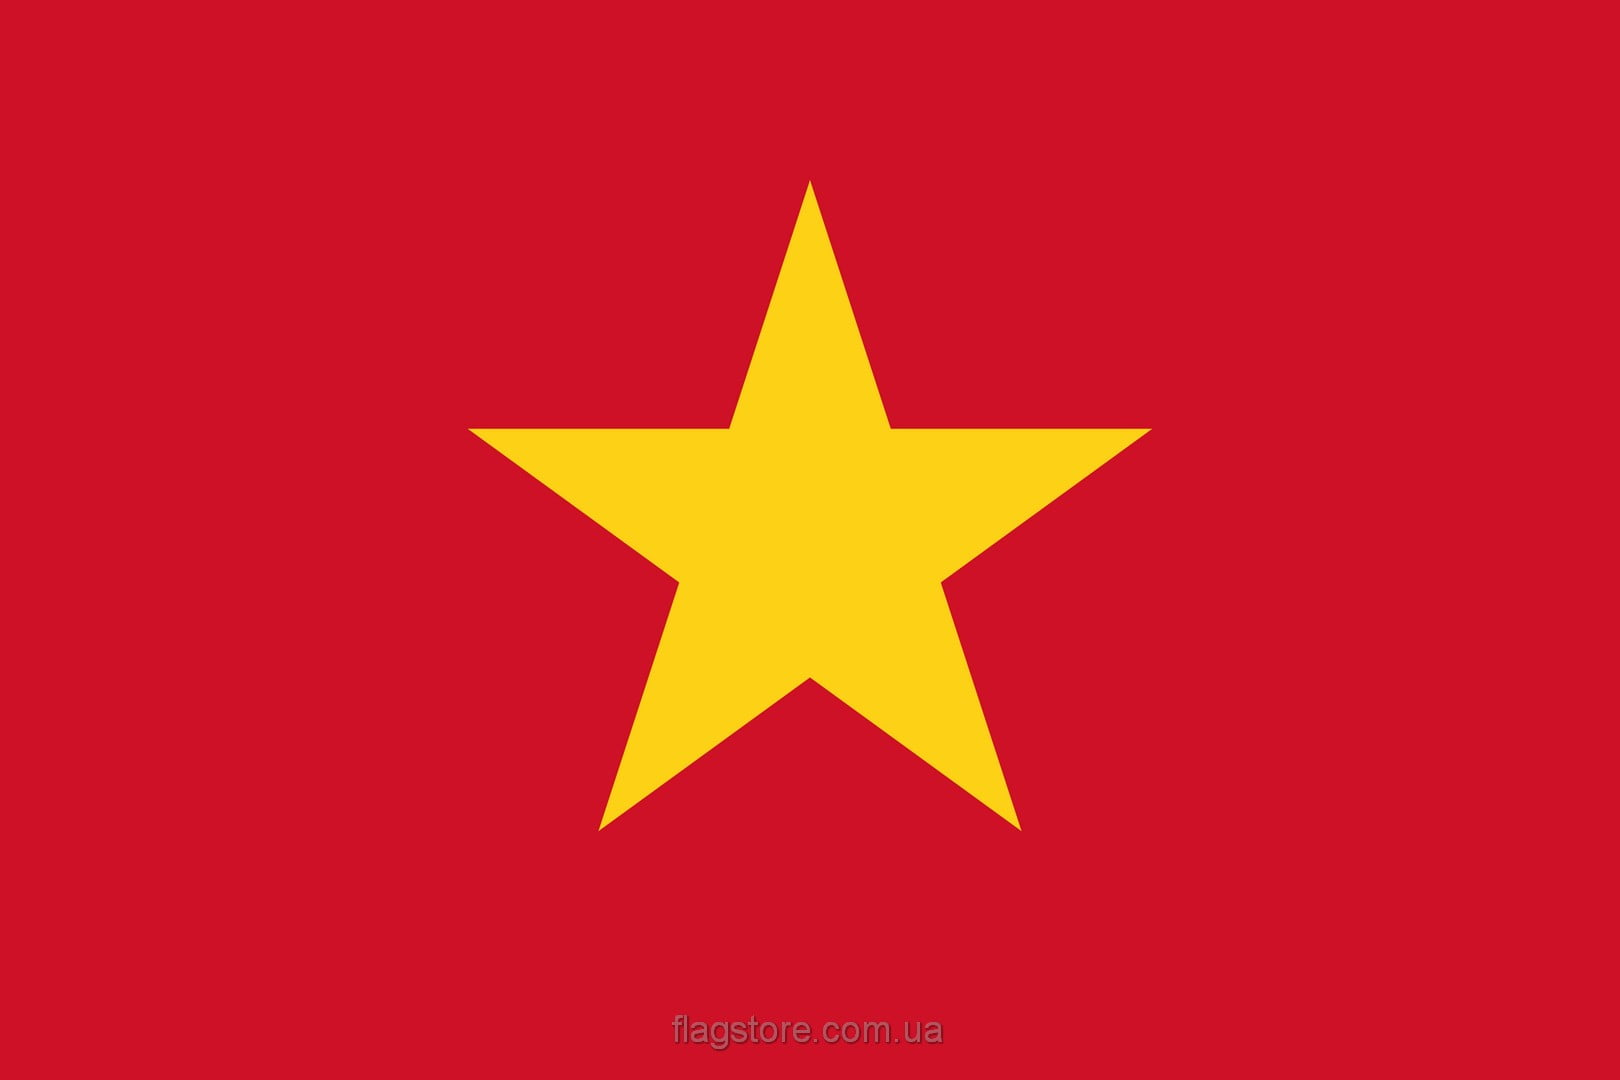 Купить флаг Вьетнама (страны Вьетнам)